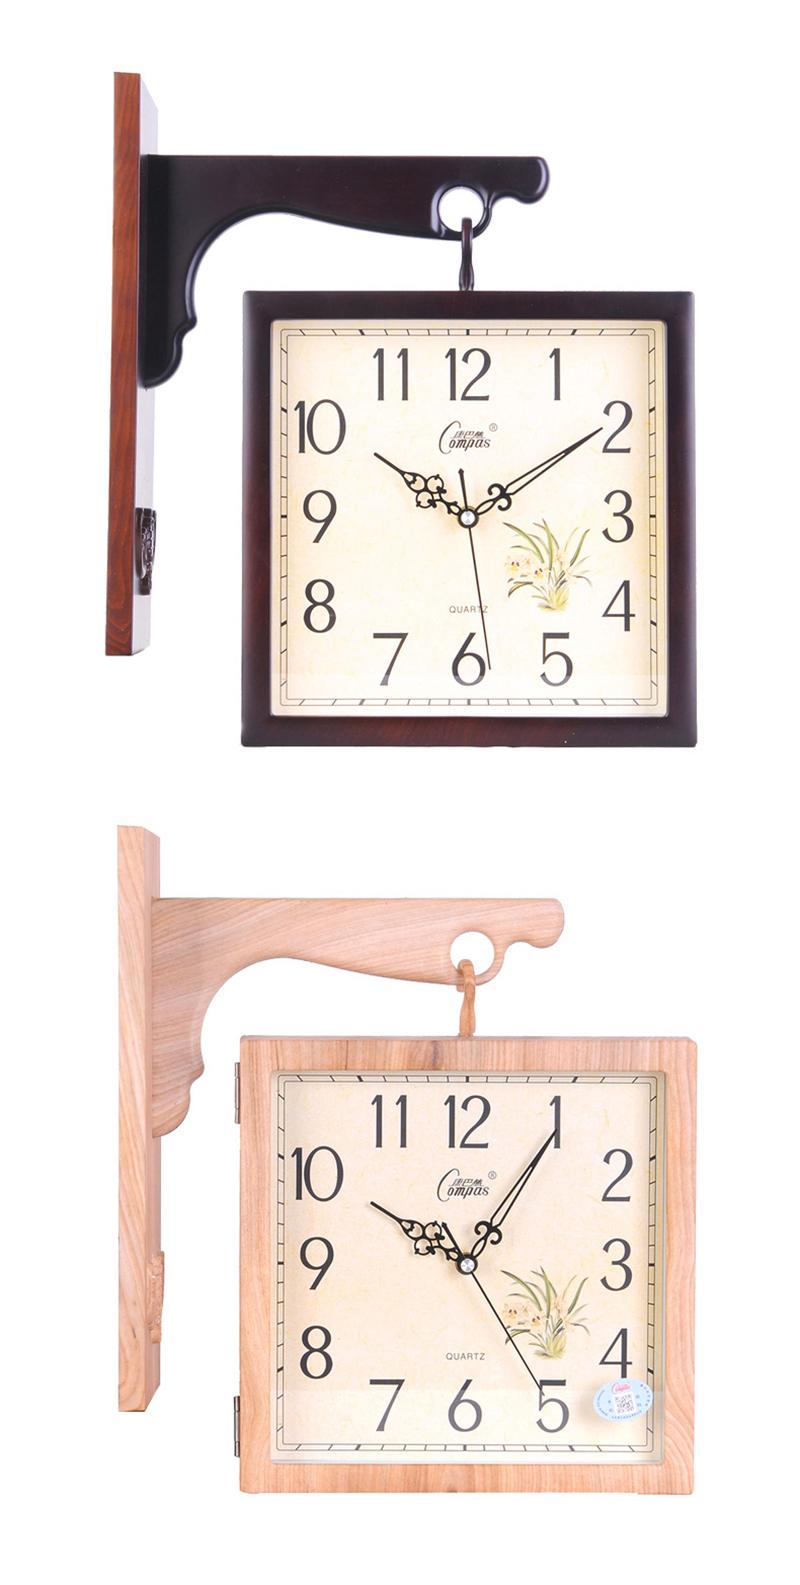 Wall Clock Wall Clock Wood Digital Wall Clock Led 3d Led Wall Clock Barber Shop Modern Clock Wood Clock Wall Diy Clock Watch (9)